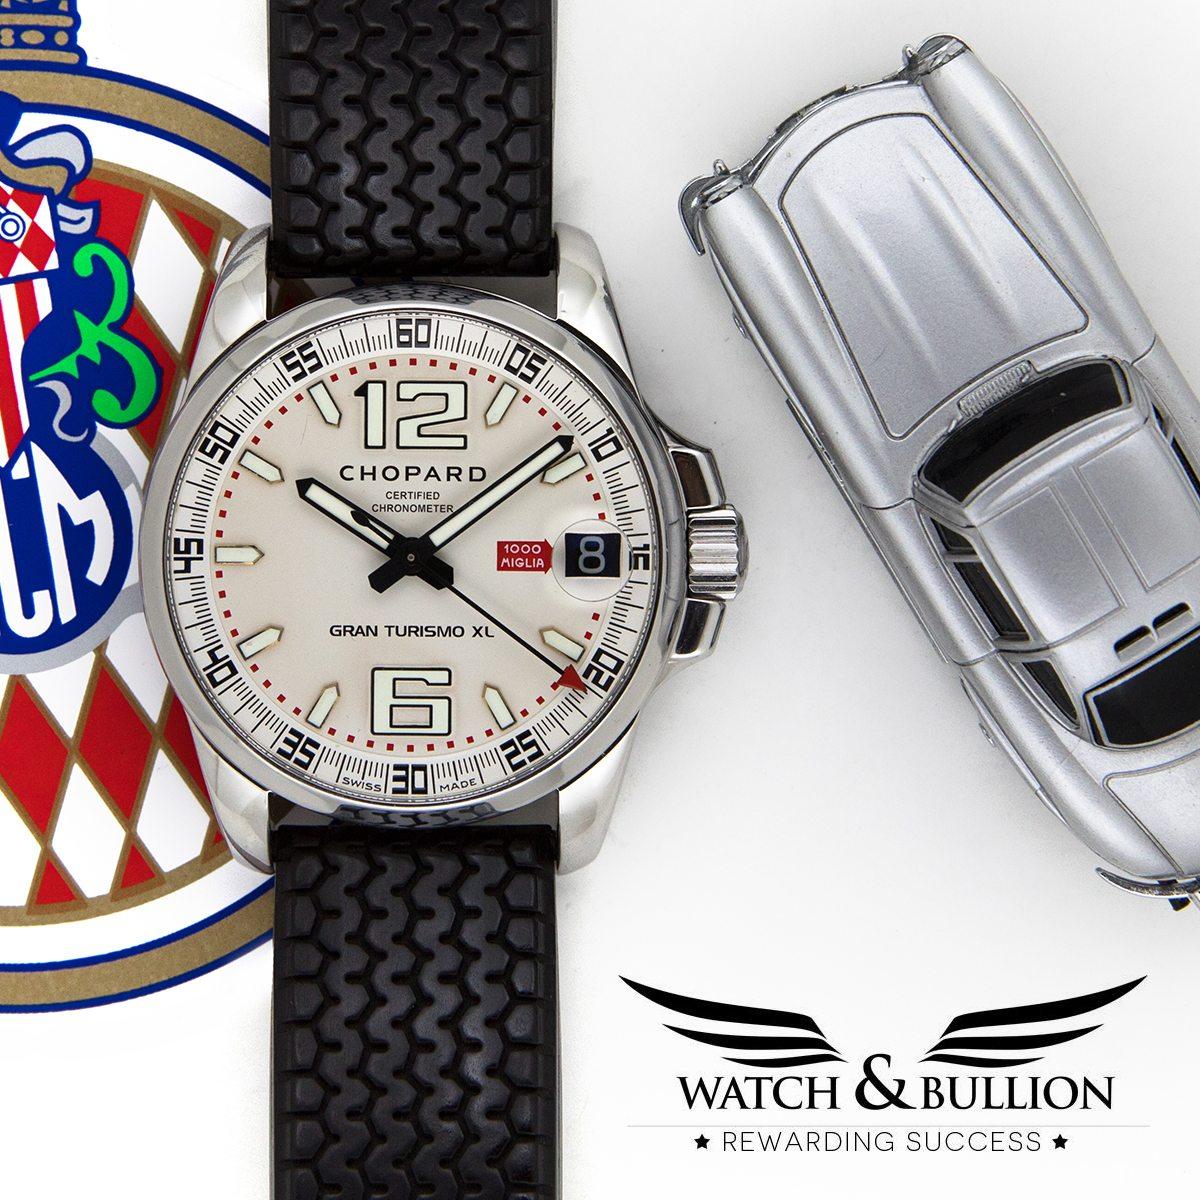 Chopard Mille Miglia GT XL Gran Turismo 16/8458 Limited Edition